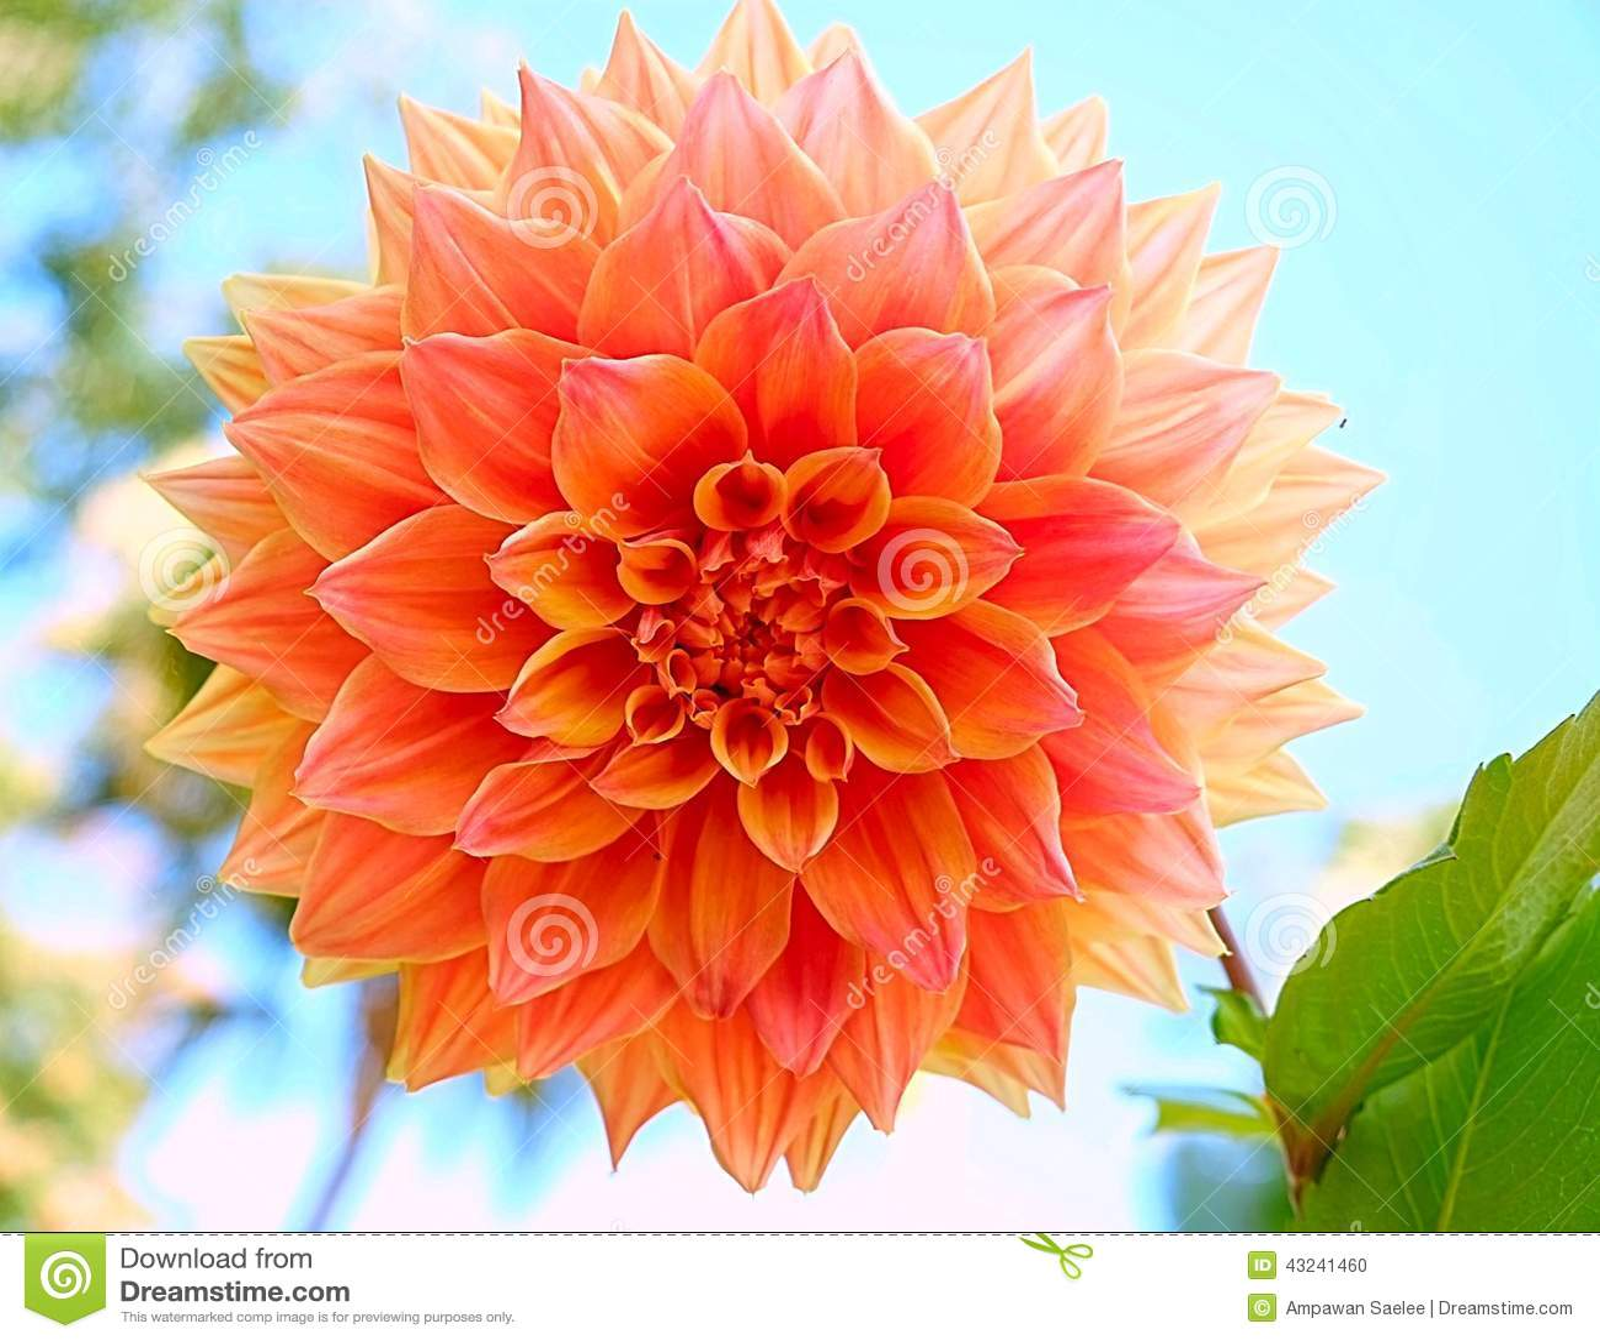 Orange Big Flower Blossom Stock Image